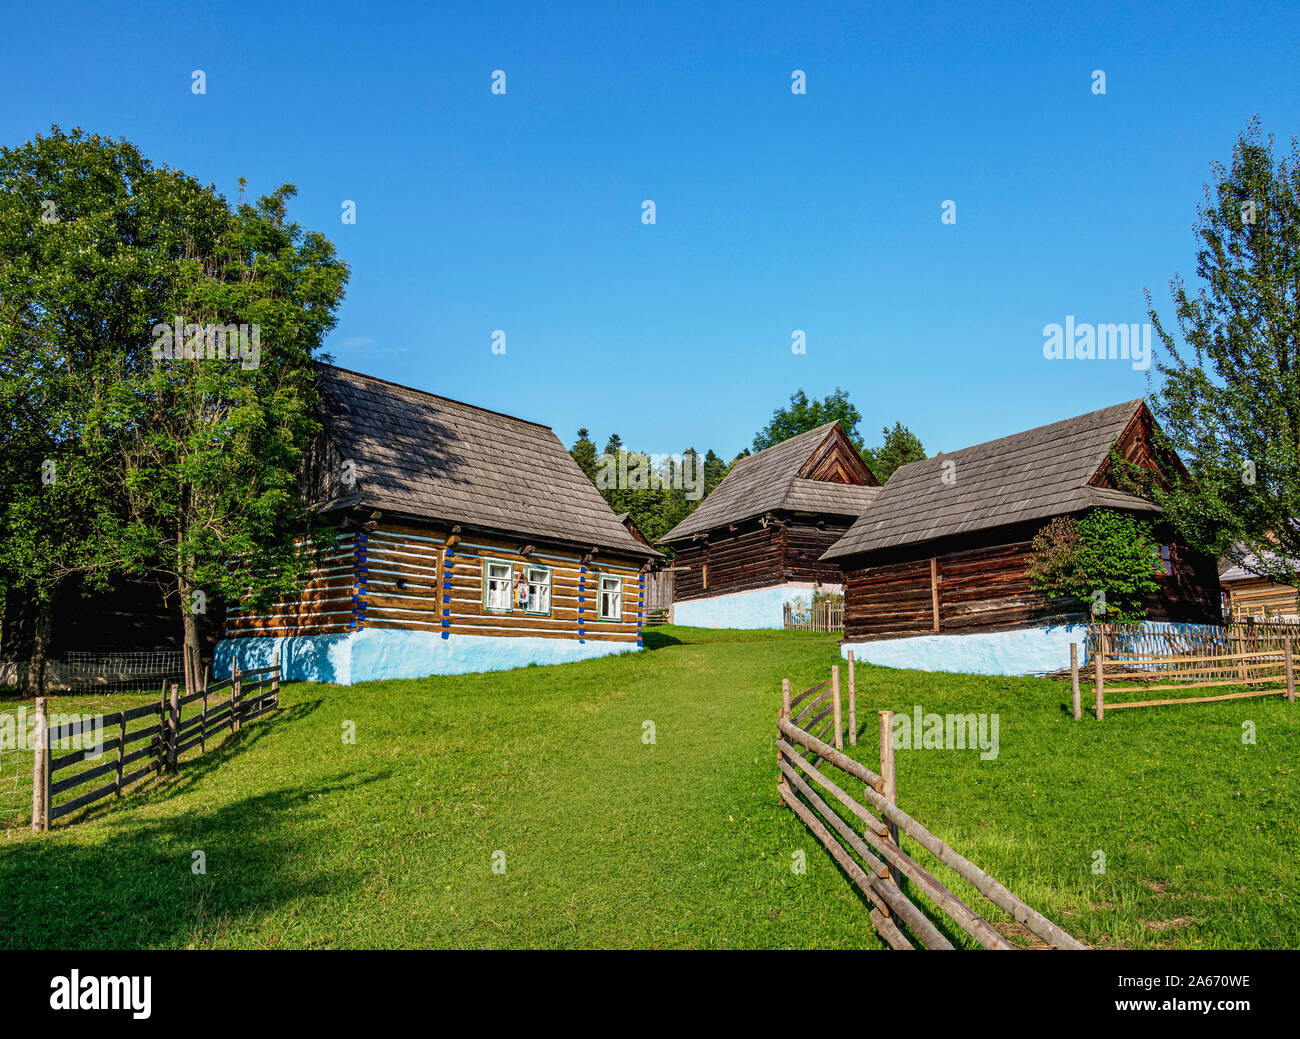 Open Air Museum at Stara Lubovna, Presov Region, Slovakia Stock Photo